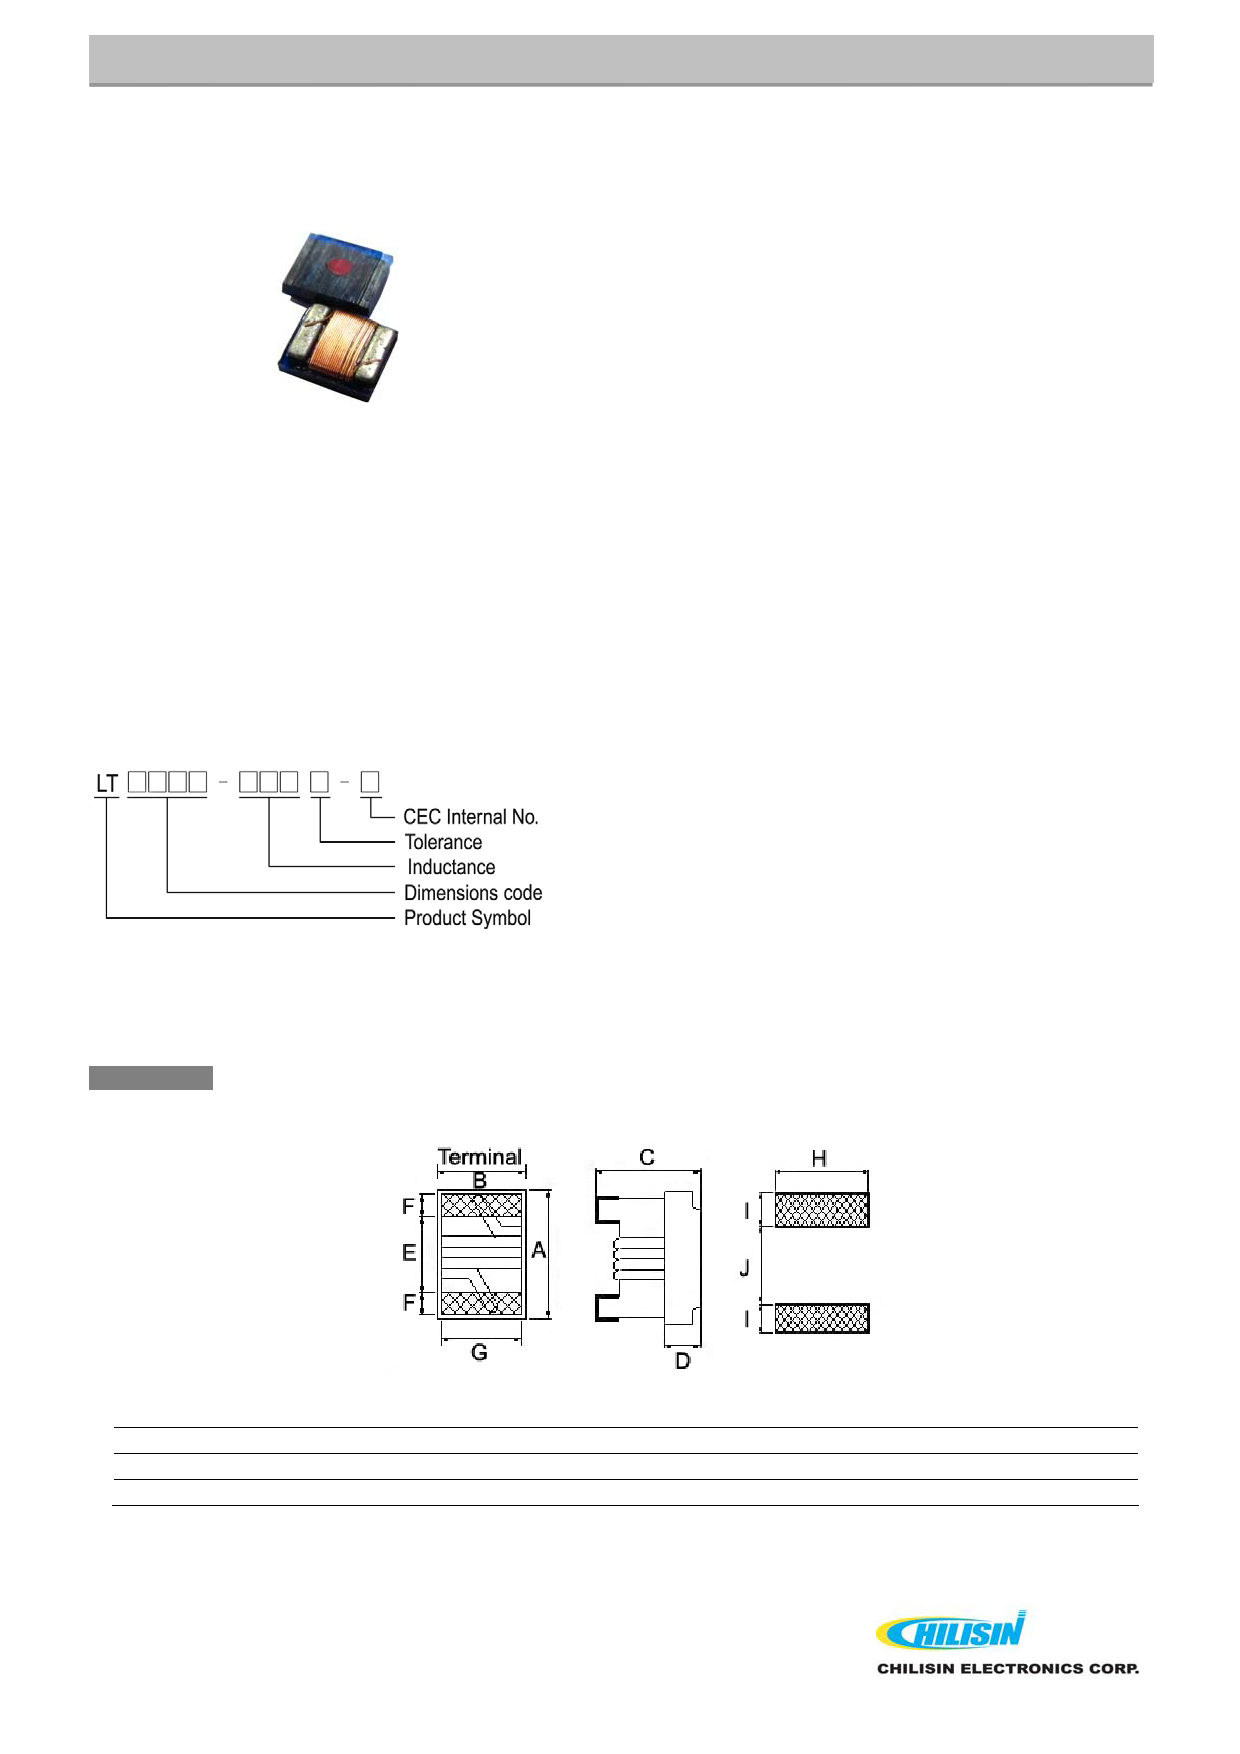 LT1210 데이터시트 및 LT1210 PDF